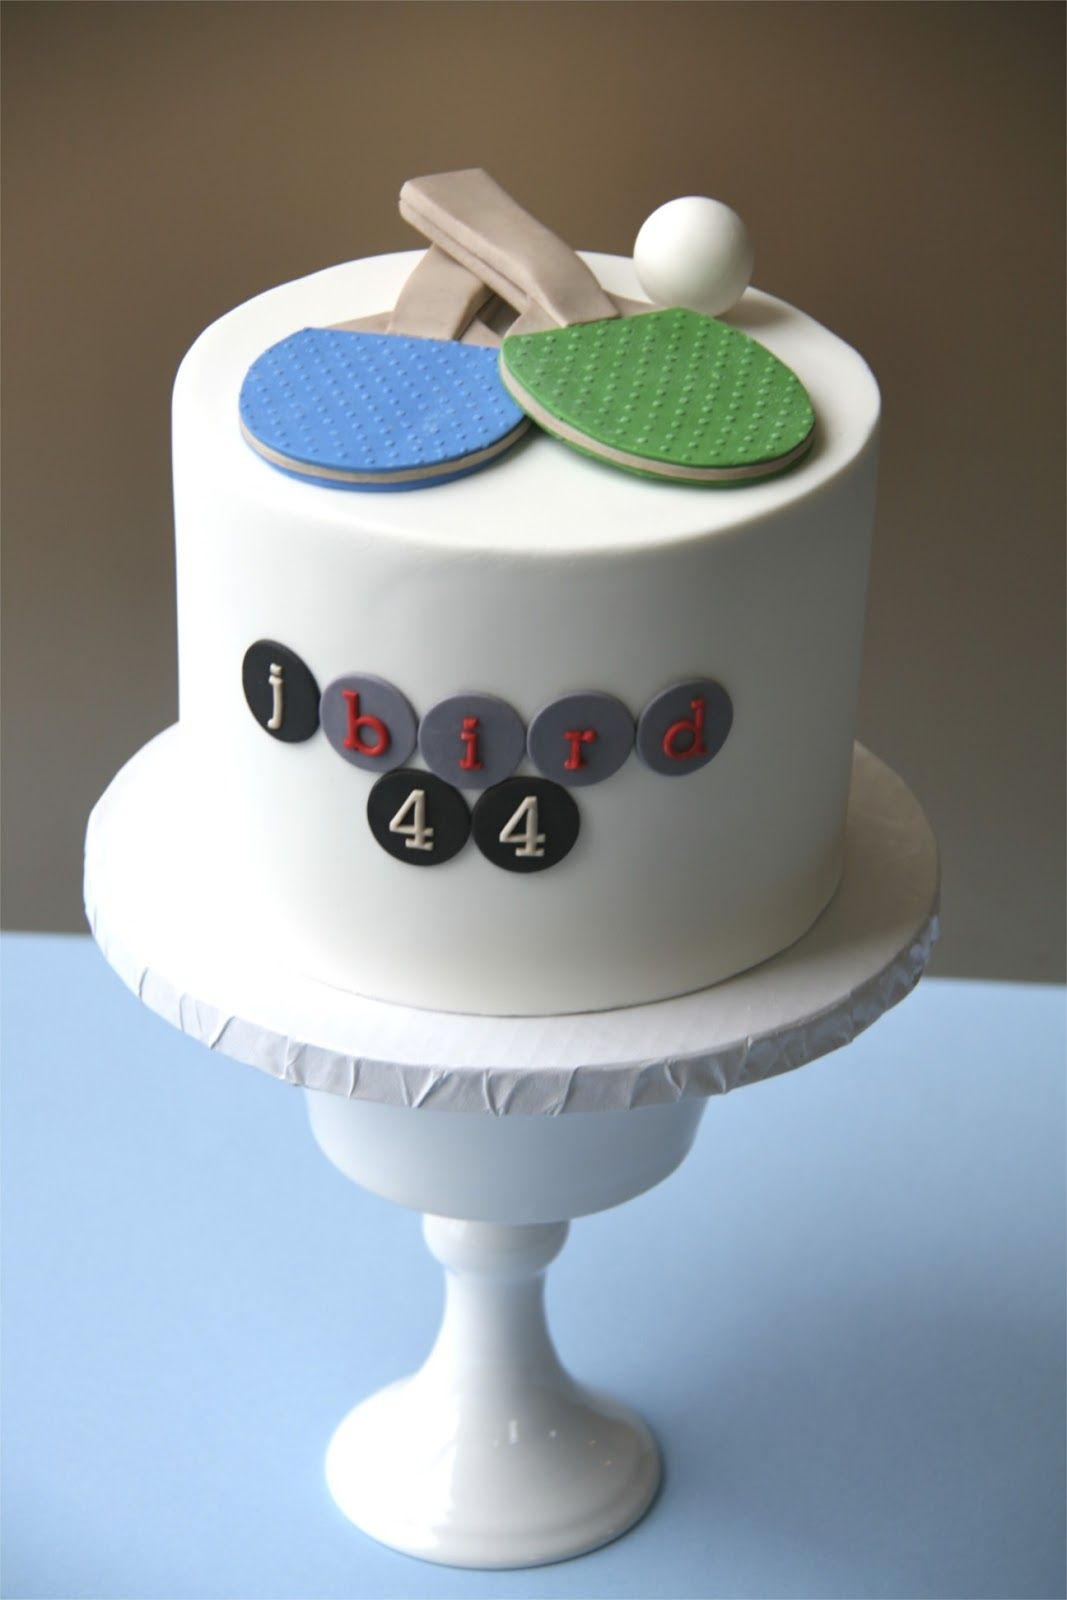 Ping Pong Cake The Paddles Look Great Tennis Cake Cake Table Birthday Cake